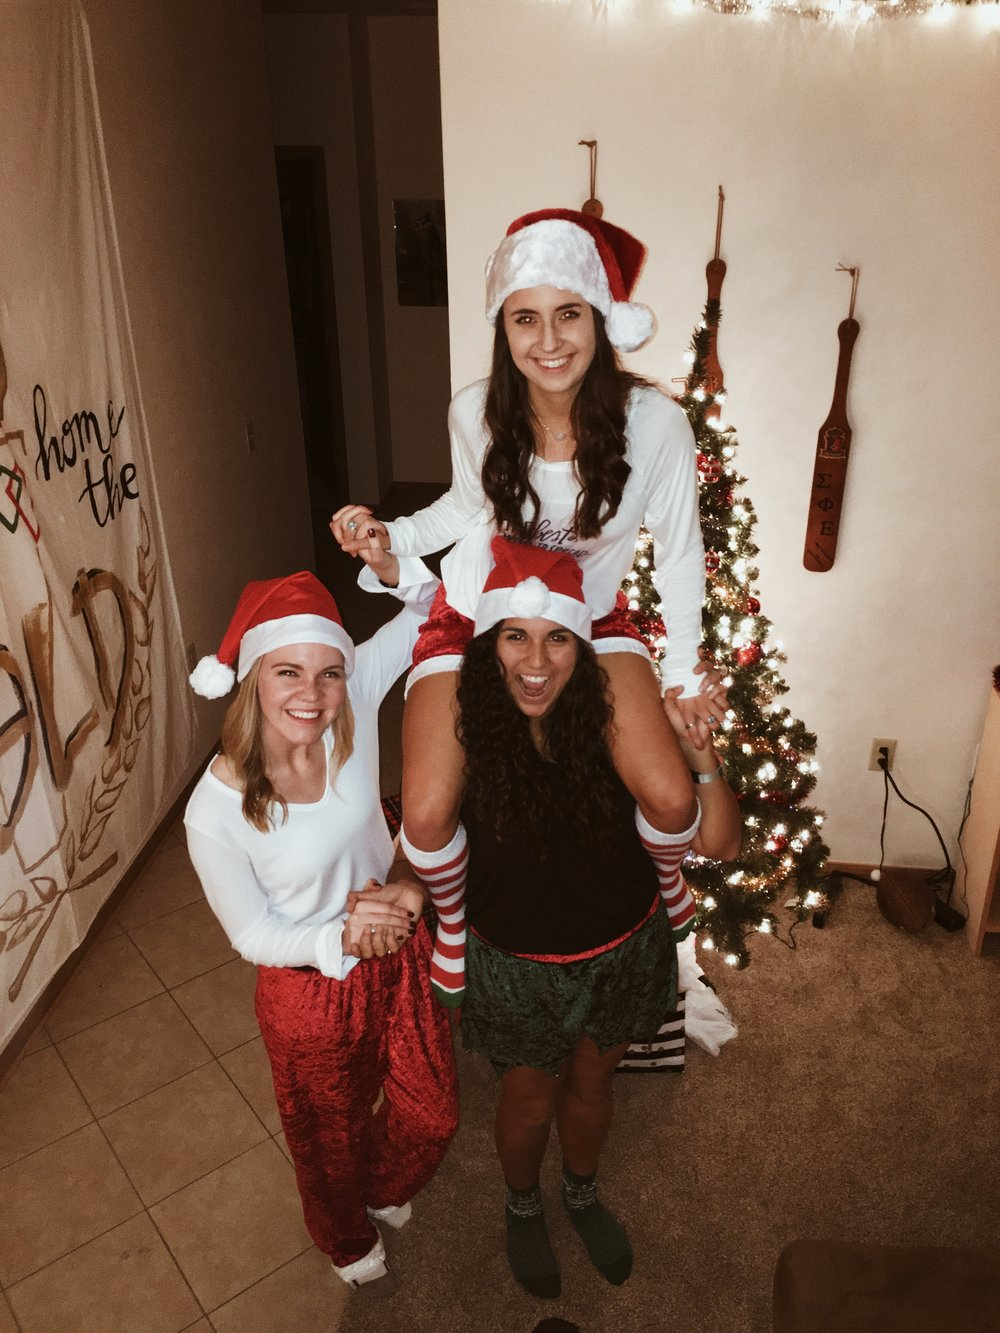 Merry Christmas peeps